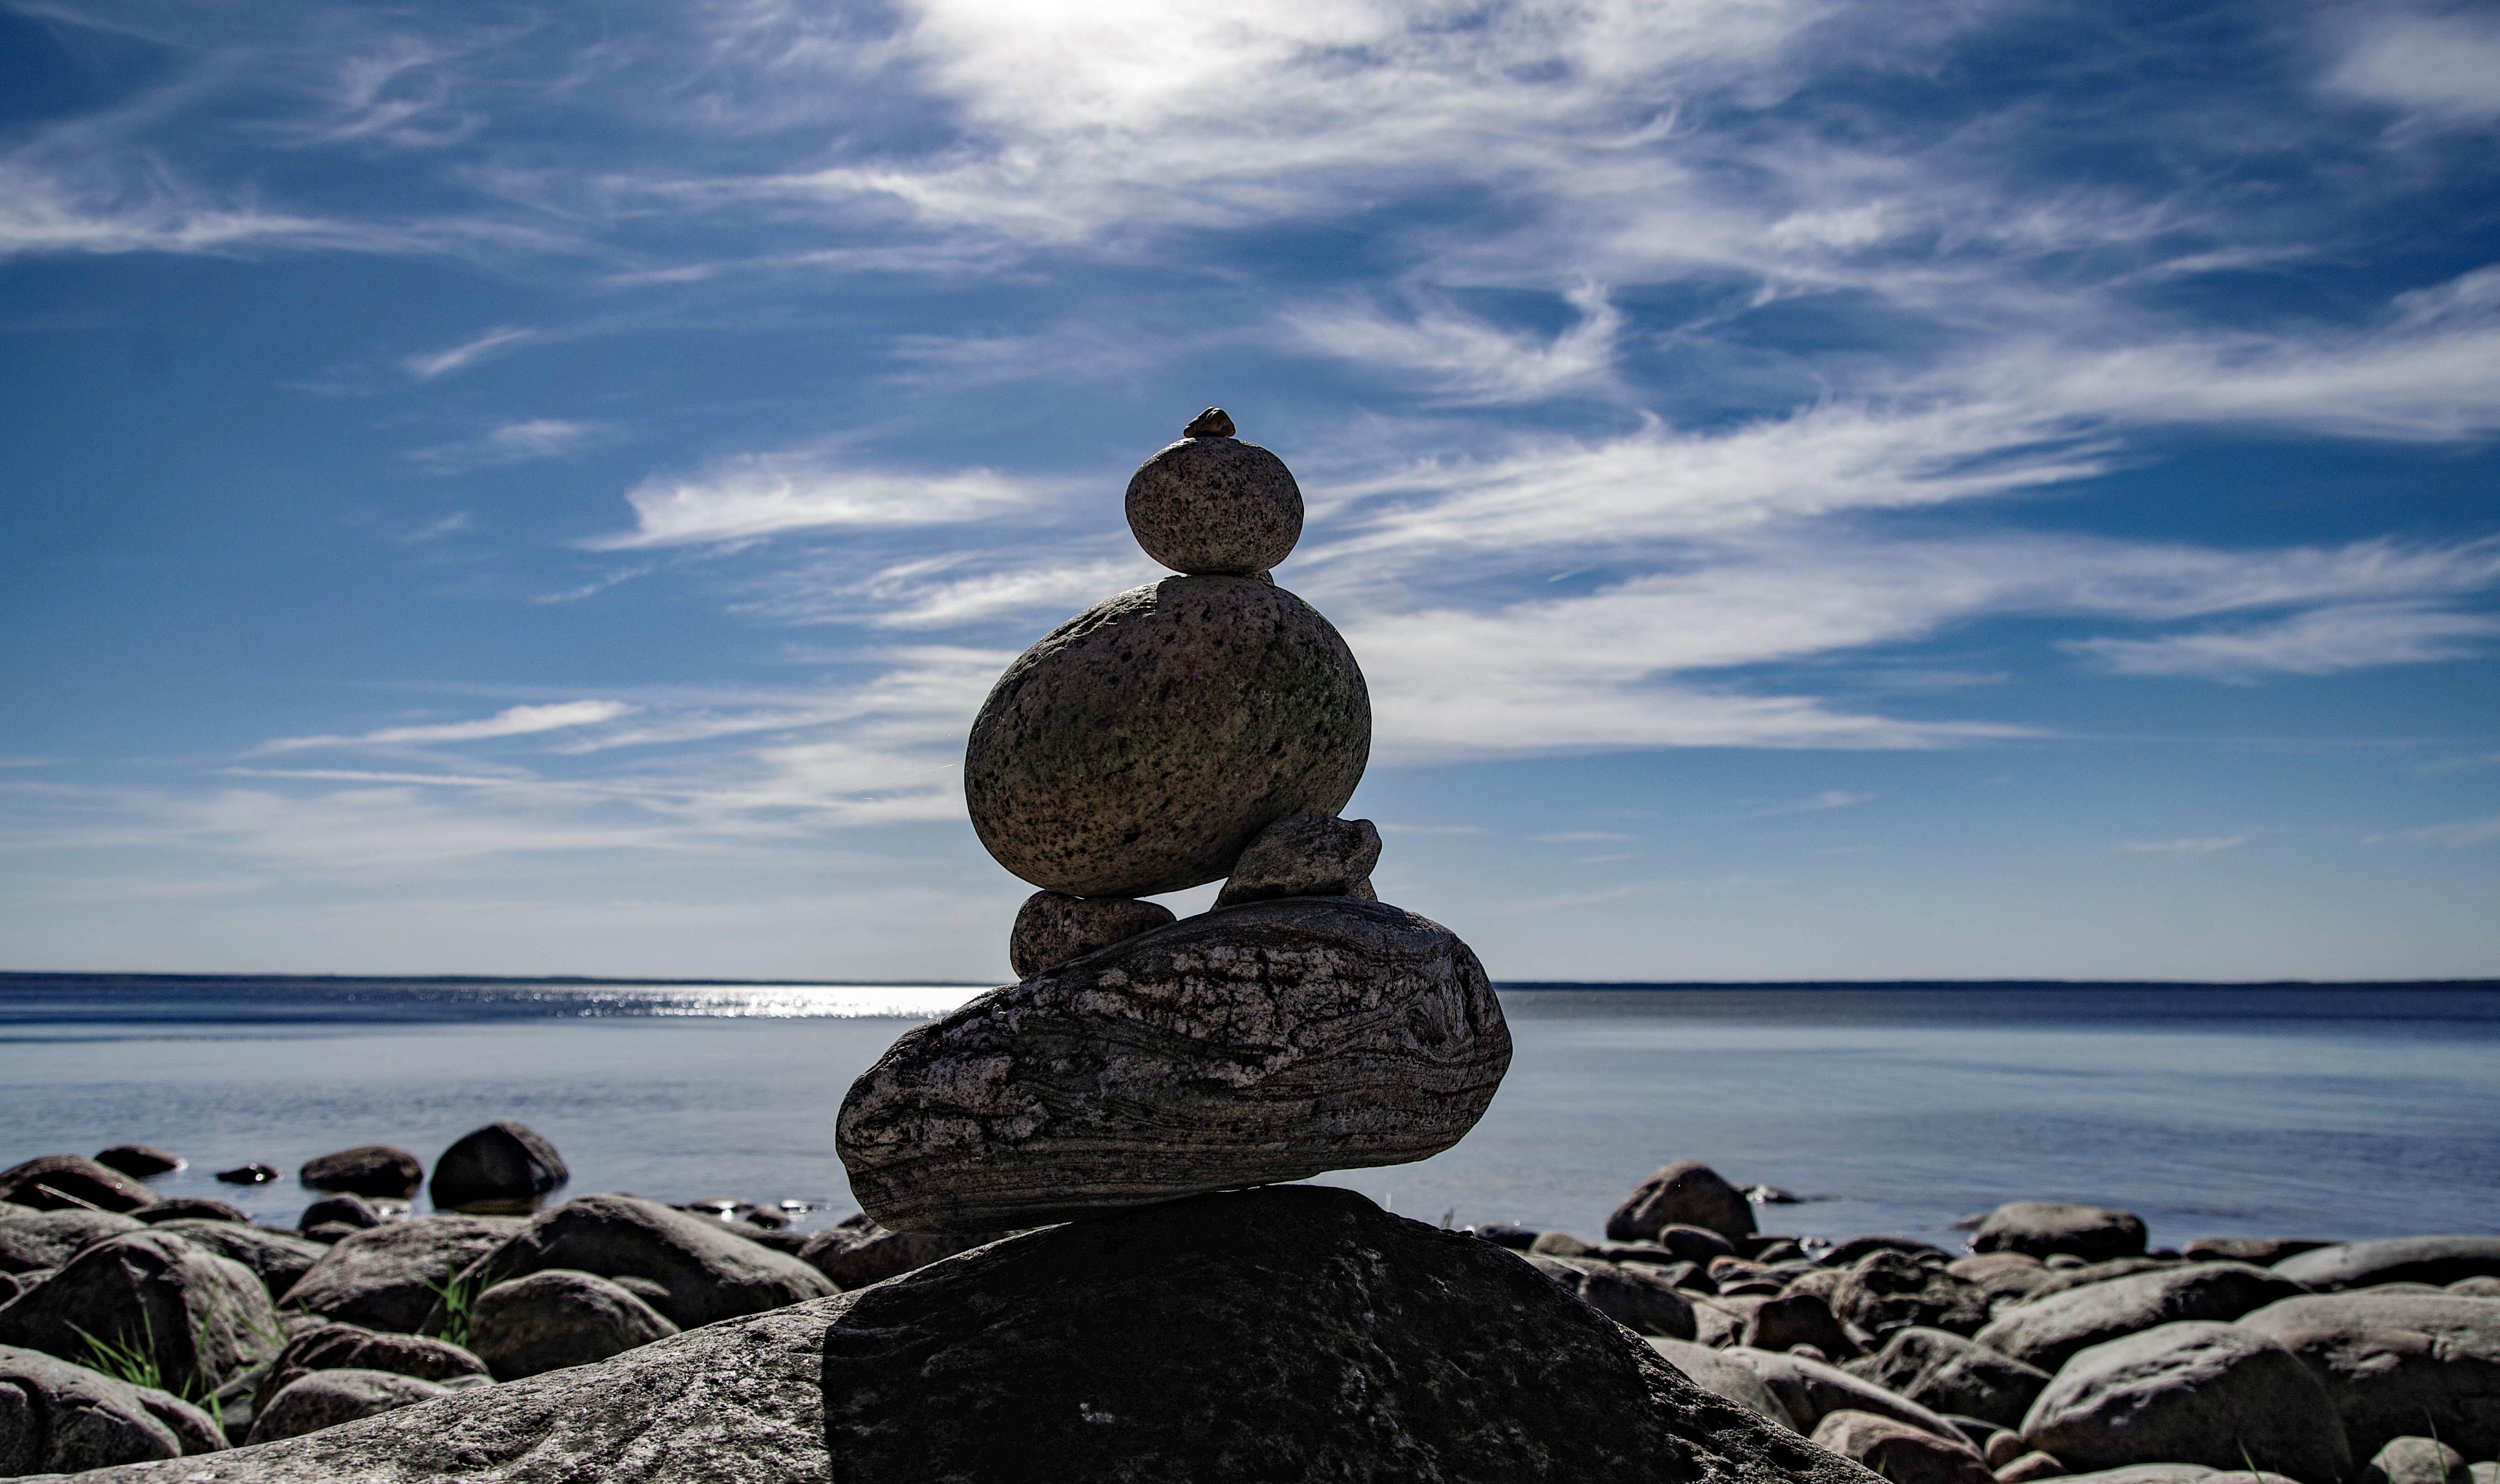 agua, apilar piedras, cielo